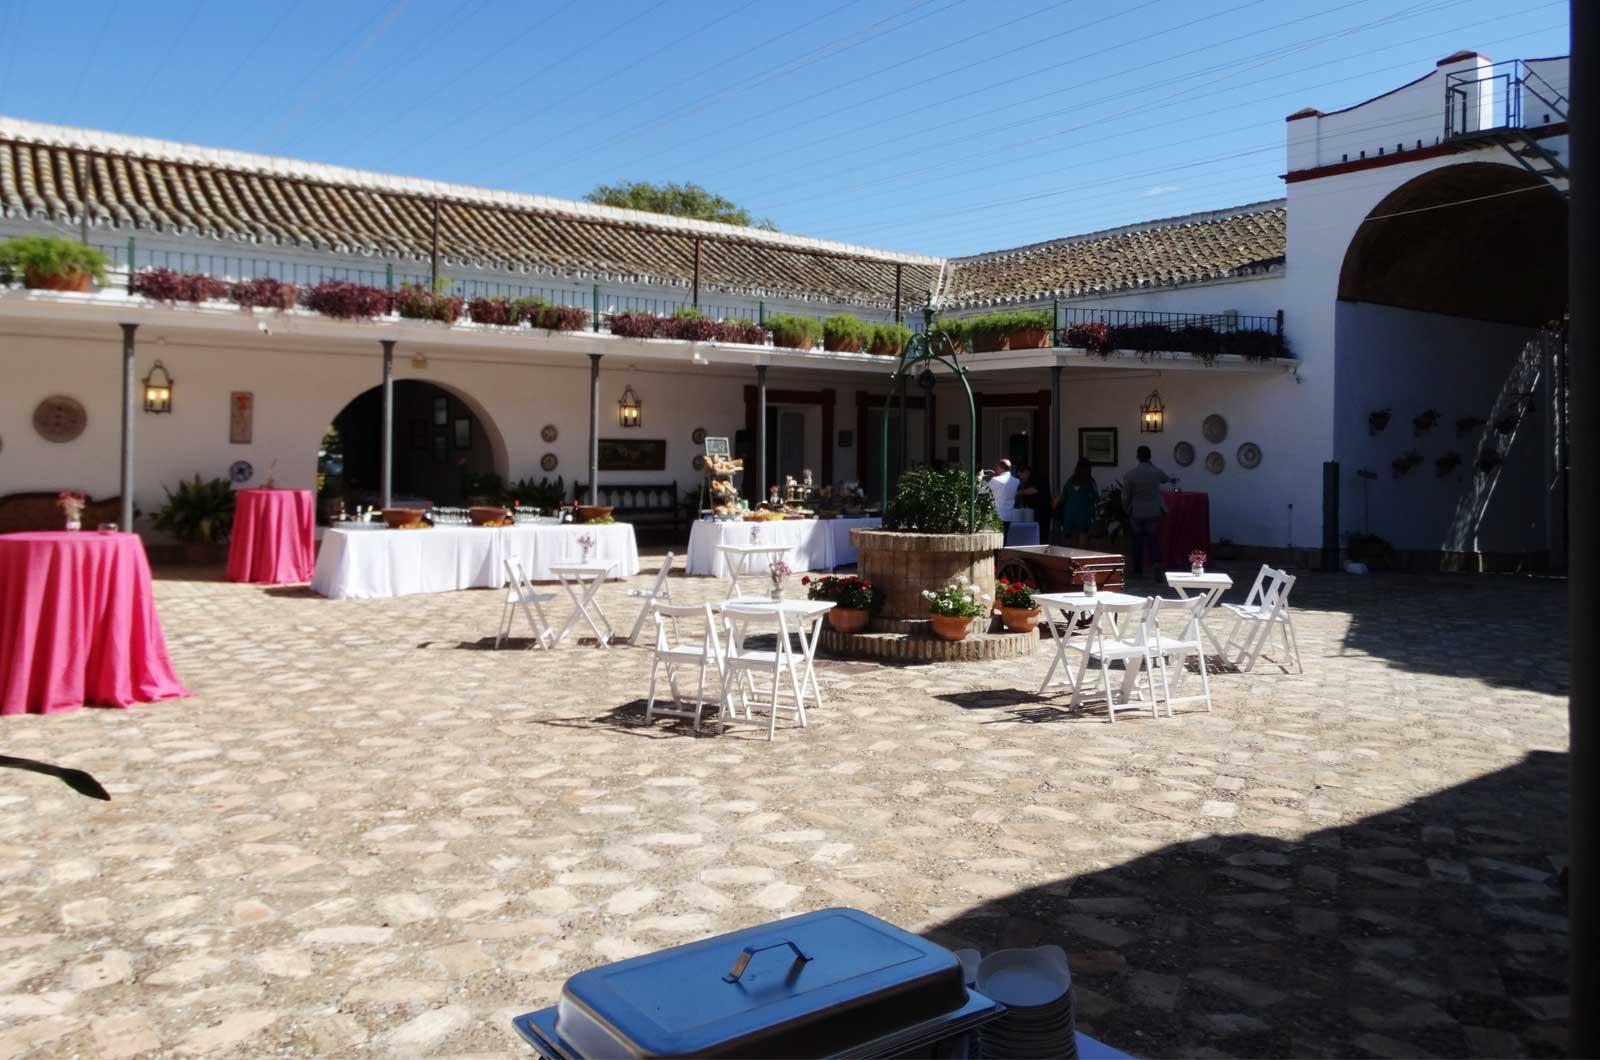 Hacienda El Trobal - patio<div style='clear:both;width:100%;height:0px;'></div><span class='cat'>Hacienda El Trobal</span><div style='clear:both;width:100%;height:0px;'></div><span class='desc'>Hacienda El Trobal - patio</span>